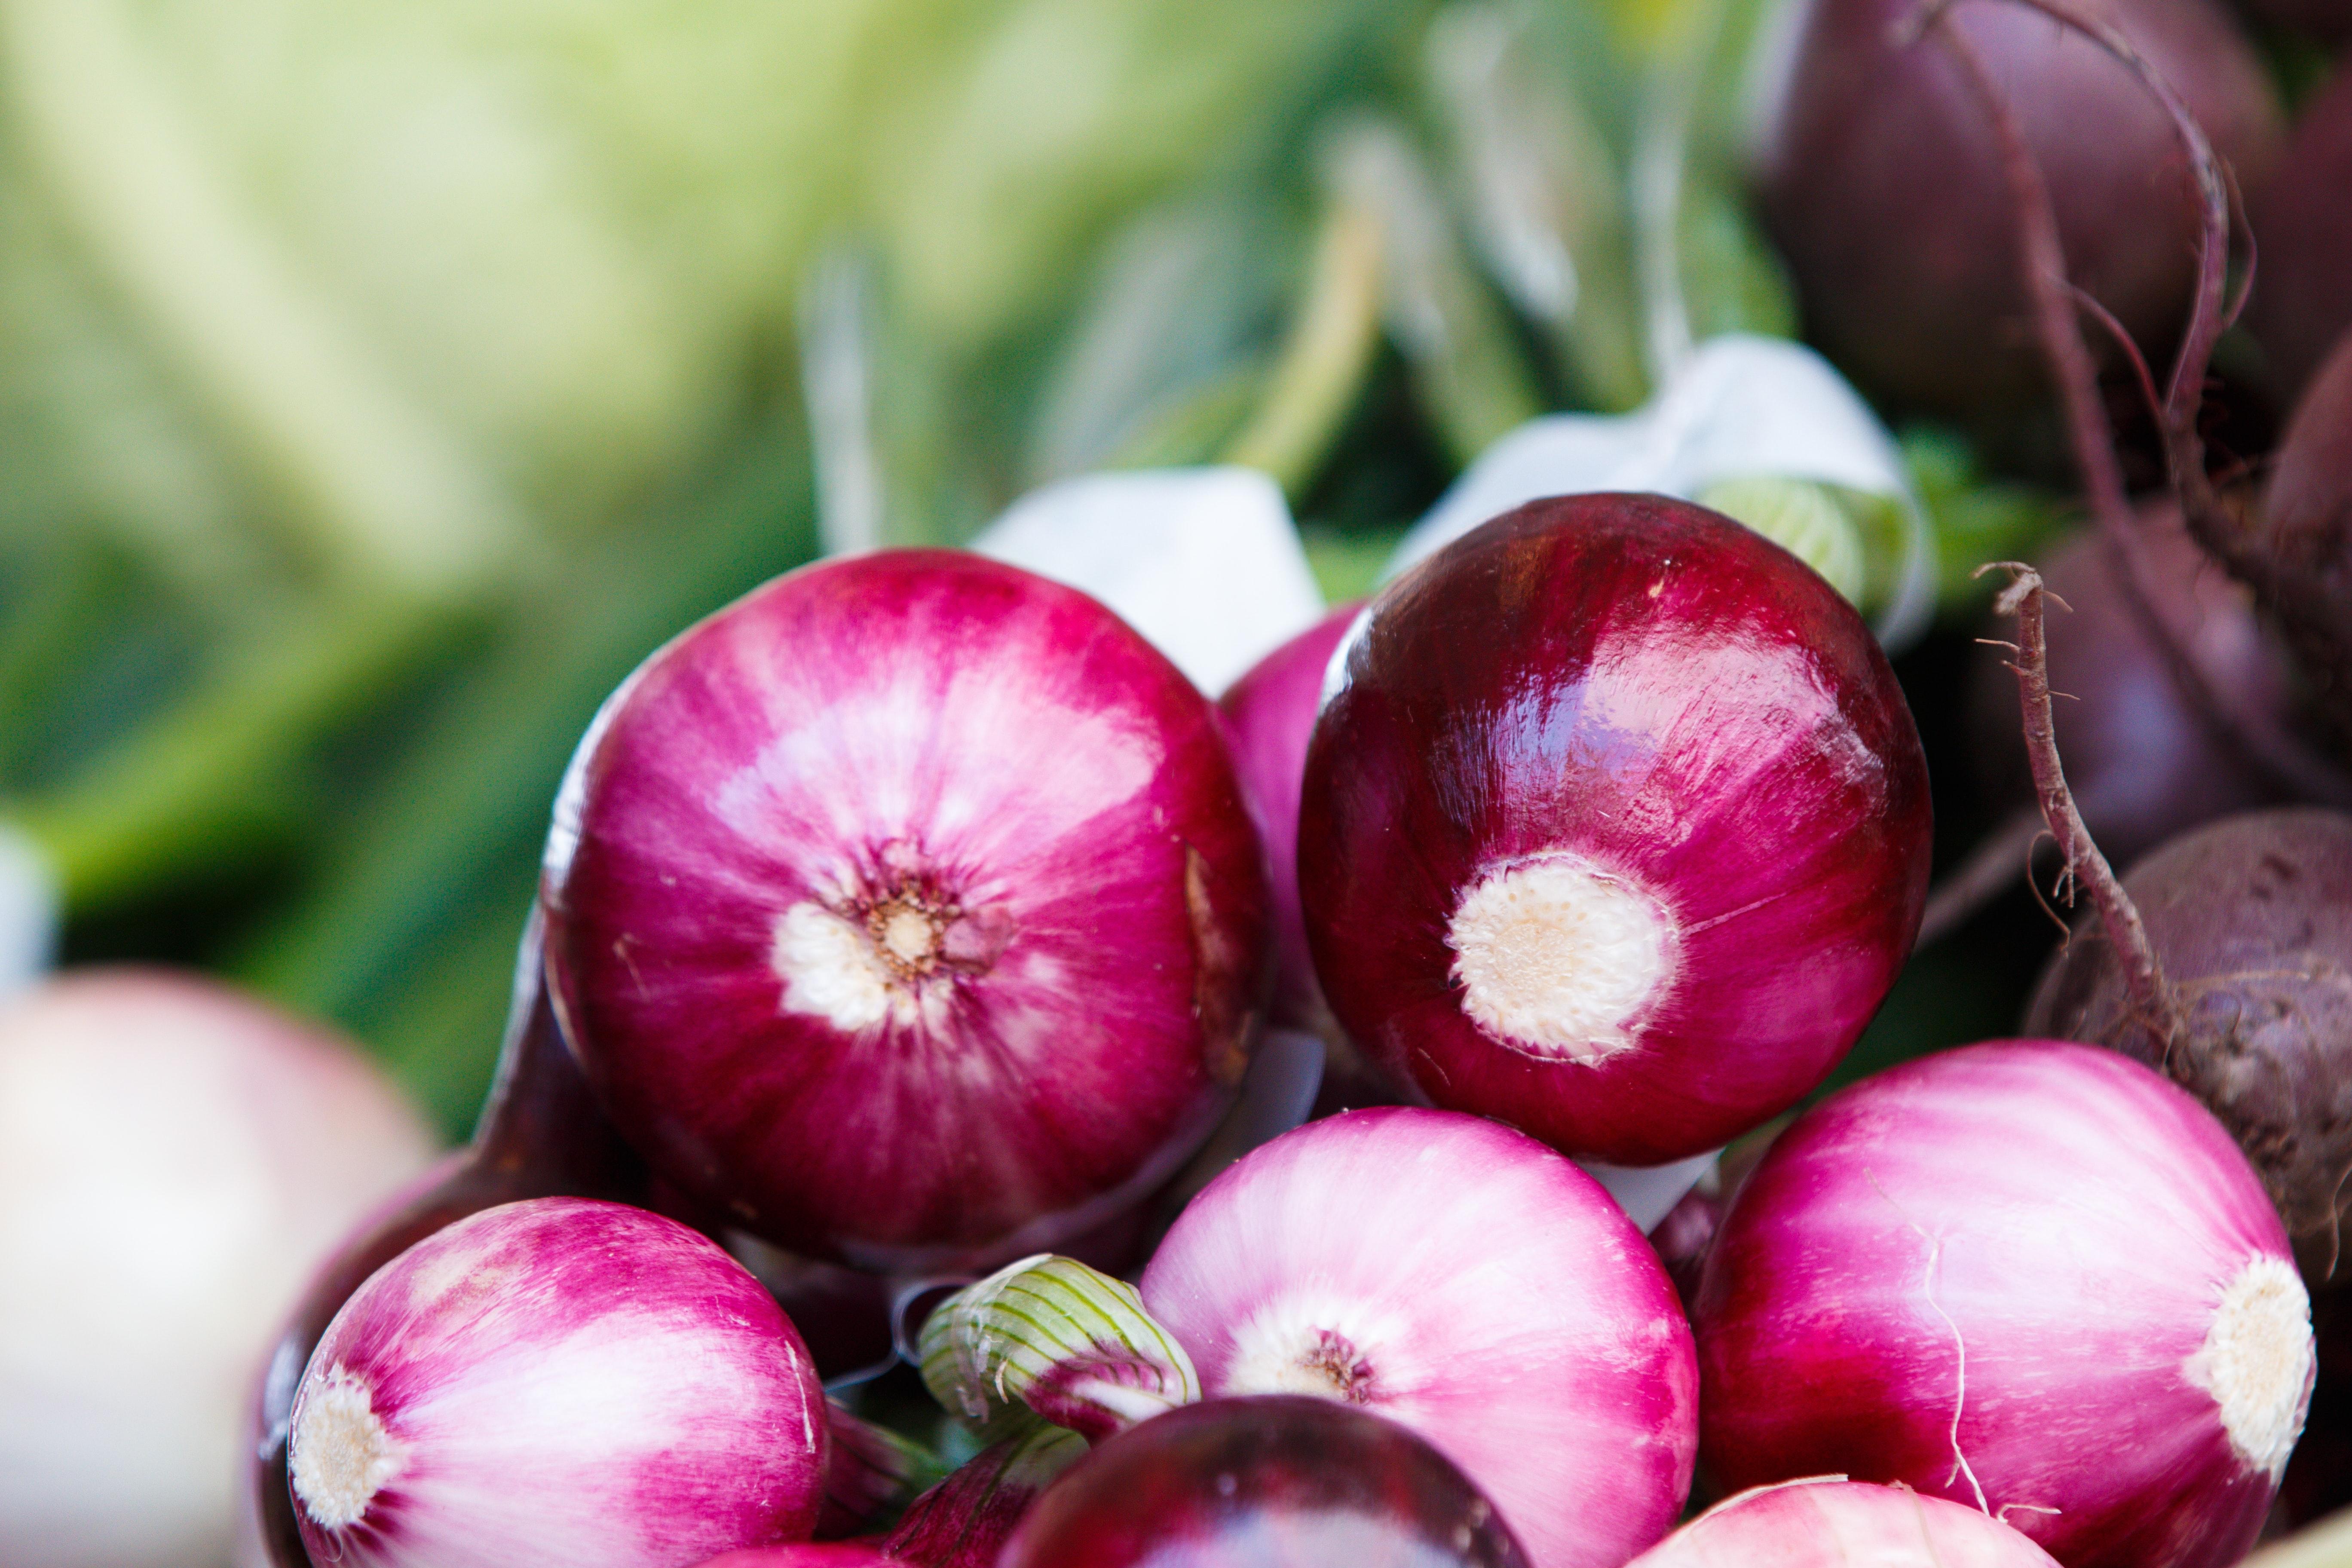 thomas-martinsen-U4YdDVliDlA-unsplash red spring onions